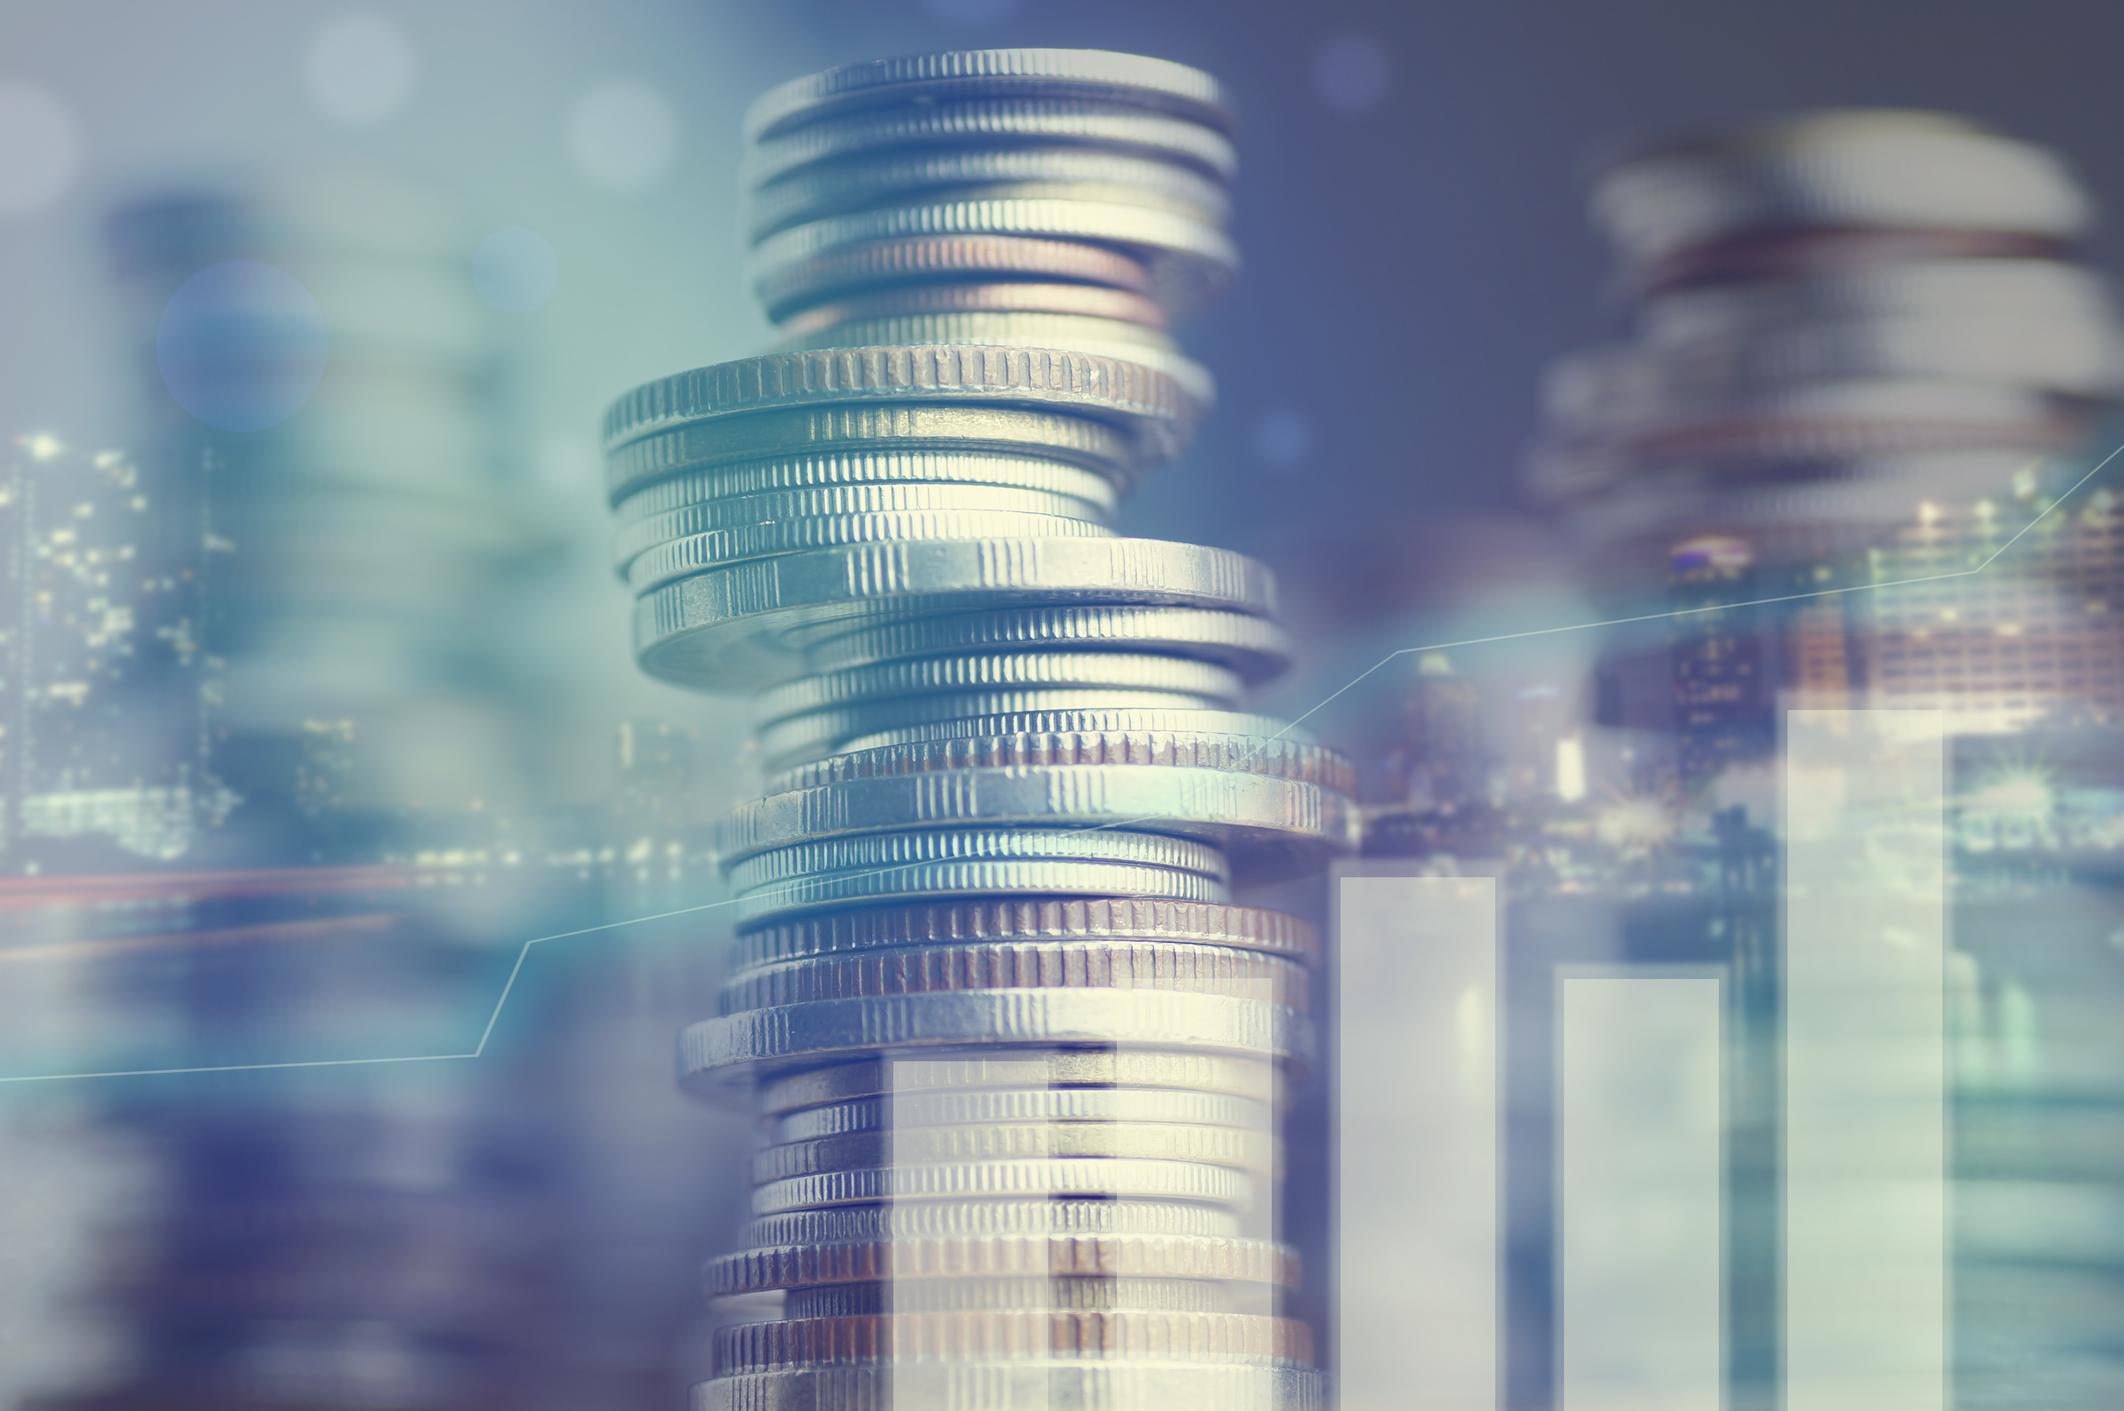 Stacks of coins behind a bar graph.